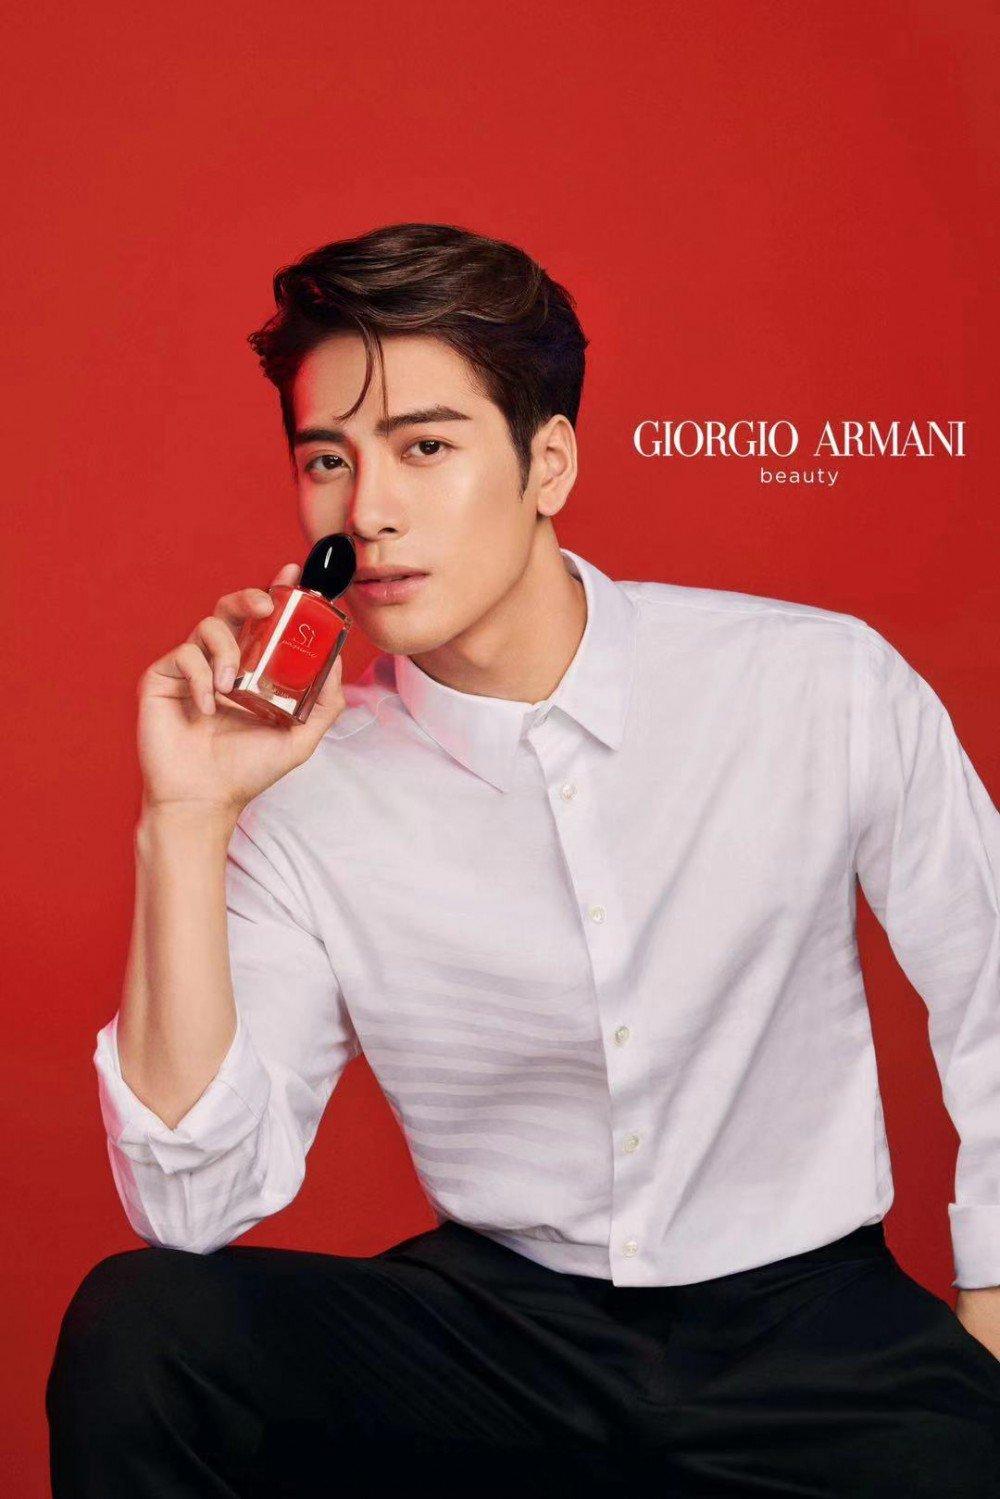 Jackson Wang Got7 Snatches Yet Another Endorsement Newest Face Of Armani Beauty Armanibeauty Allkpop